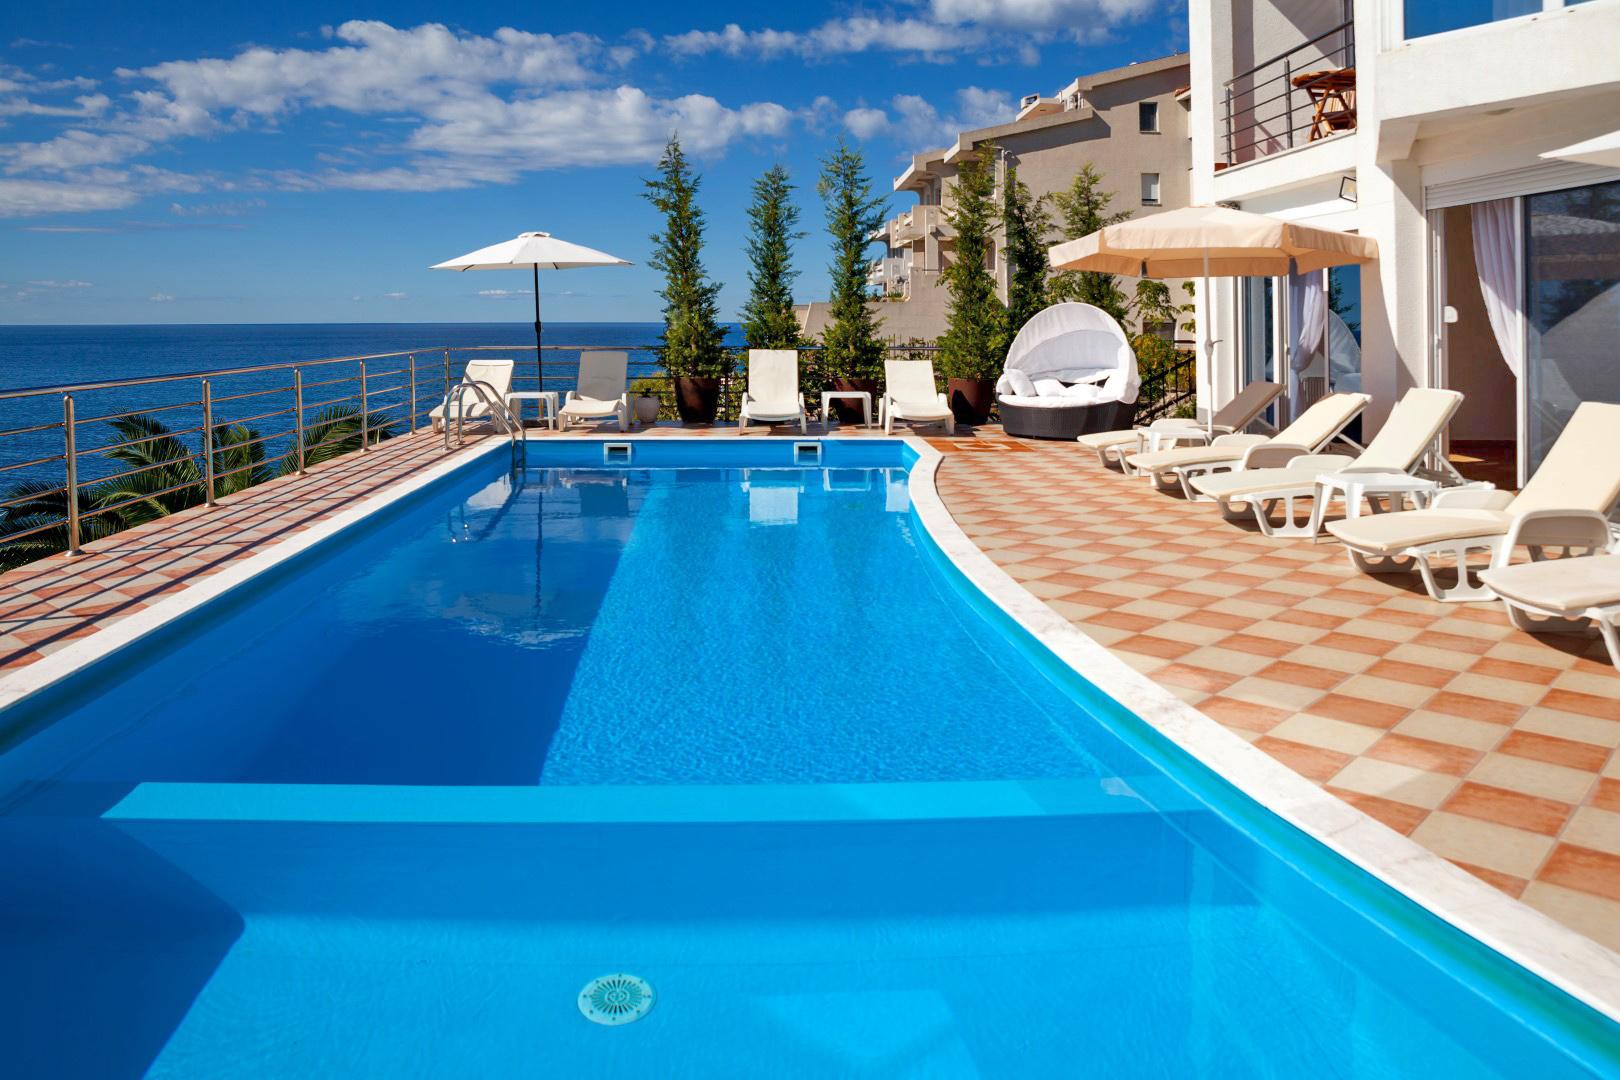 Bar, Dobre Vode – kompleks vila s bazenima, na prvoj liniji do mora